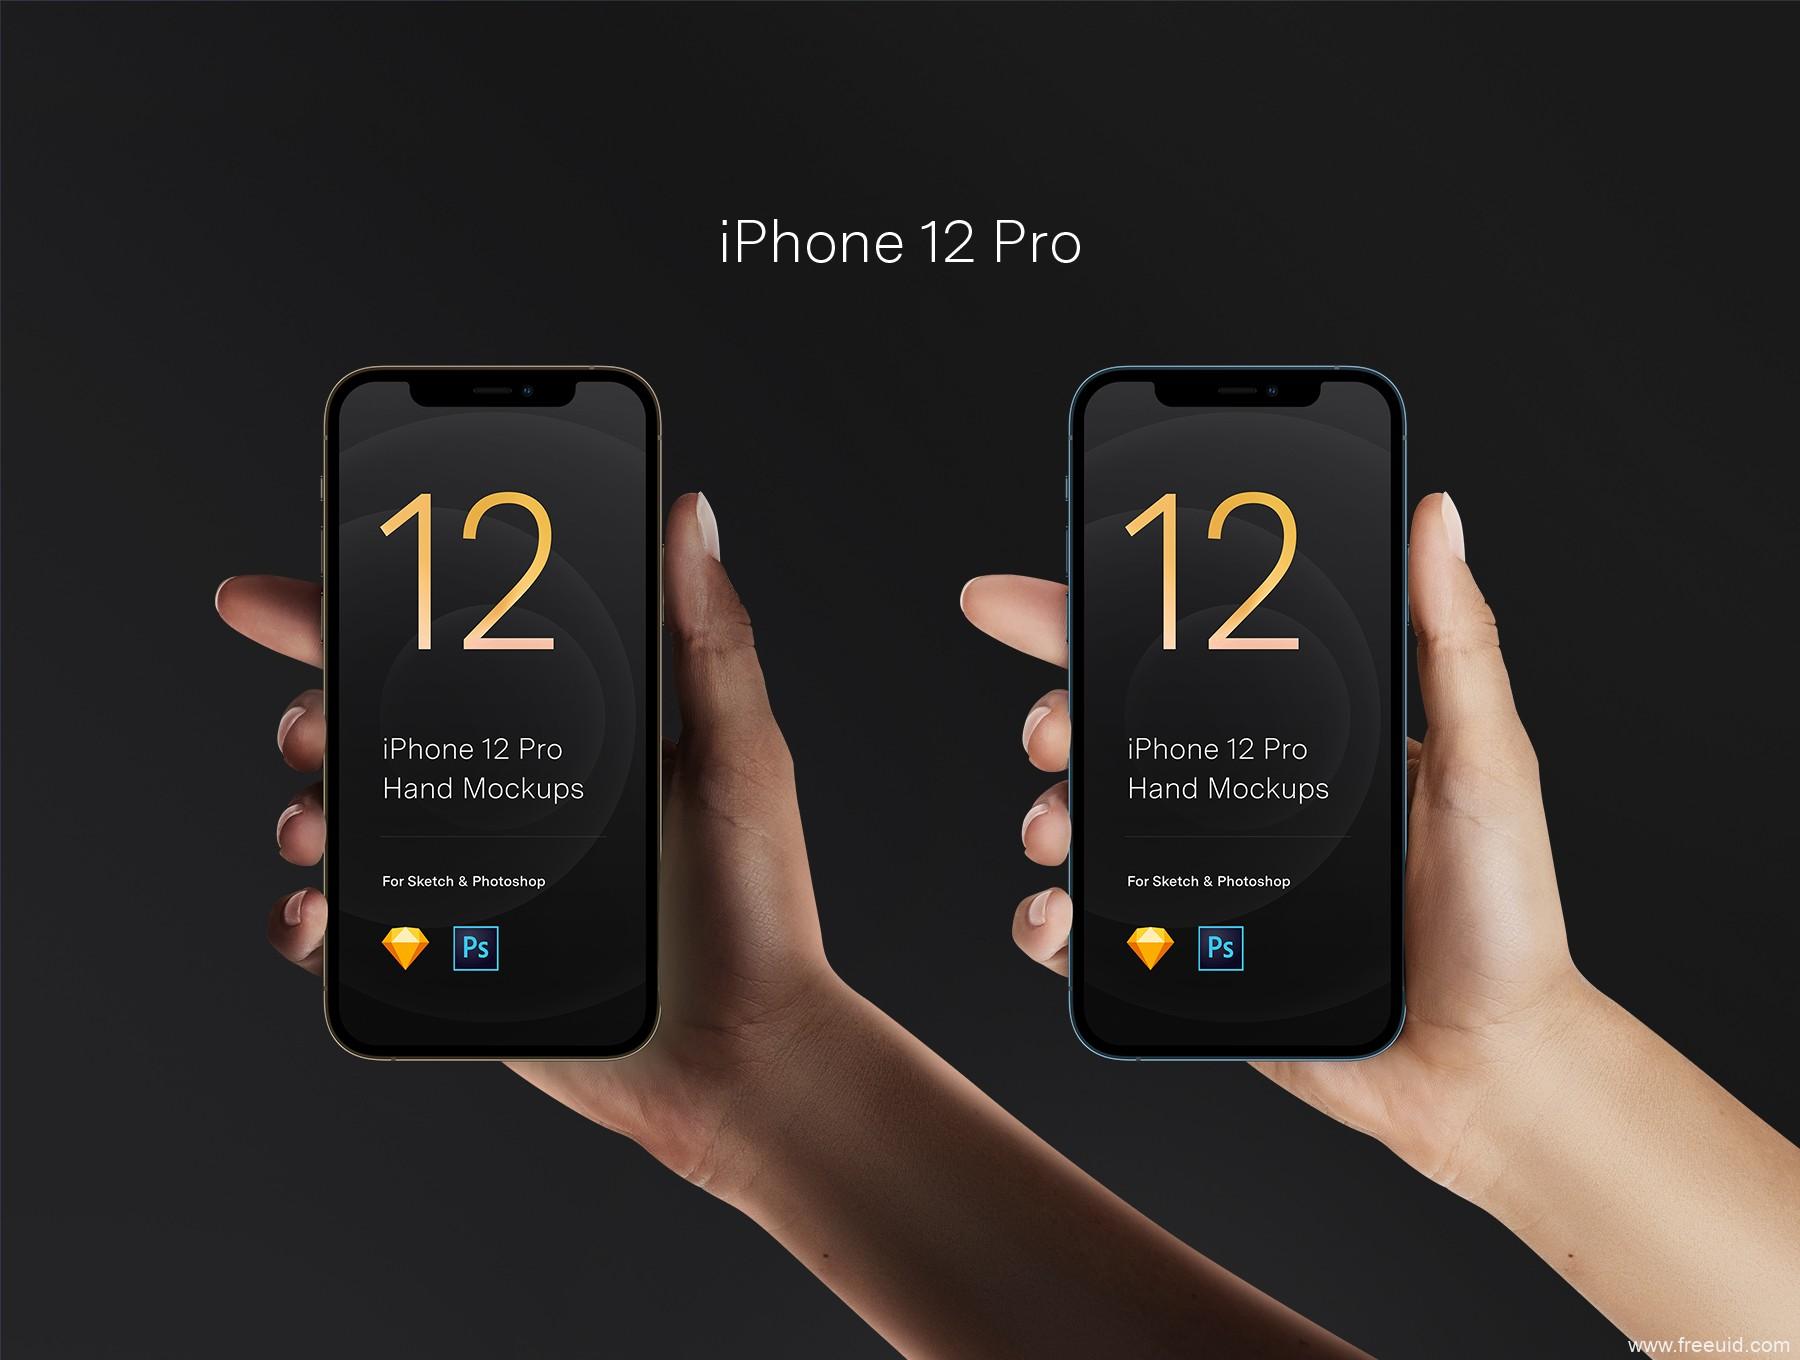 手持iPhone 12 样机mockup,手持iPhone 12 pro 样机mockup模板源文件psd下载